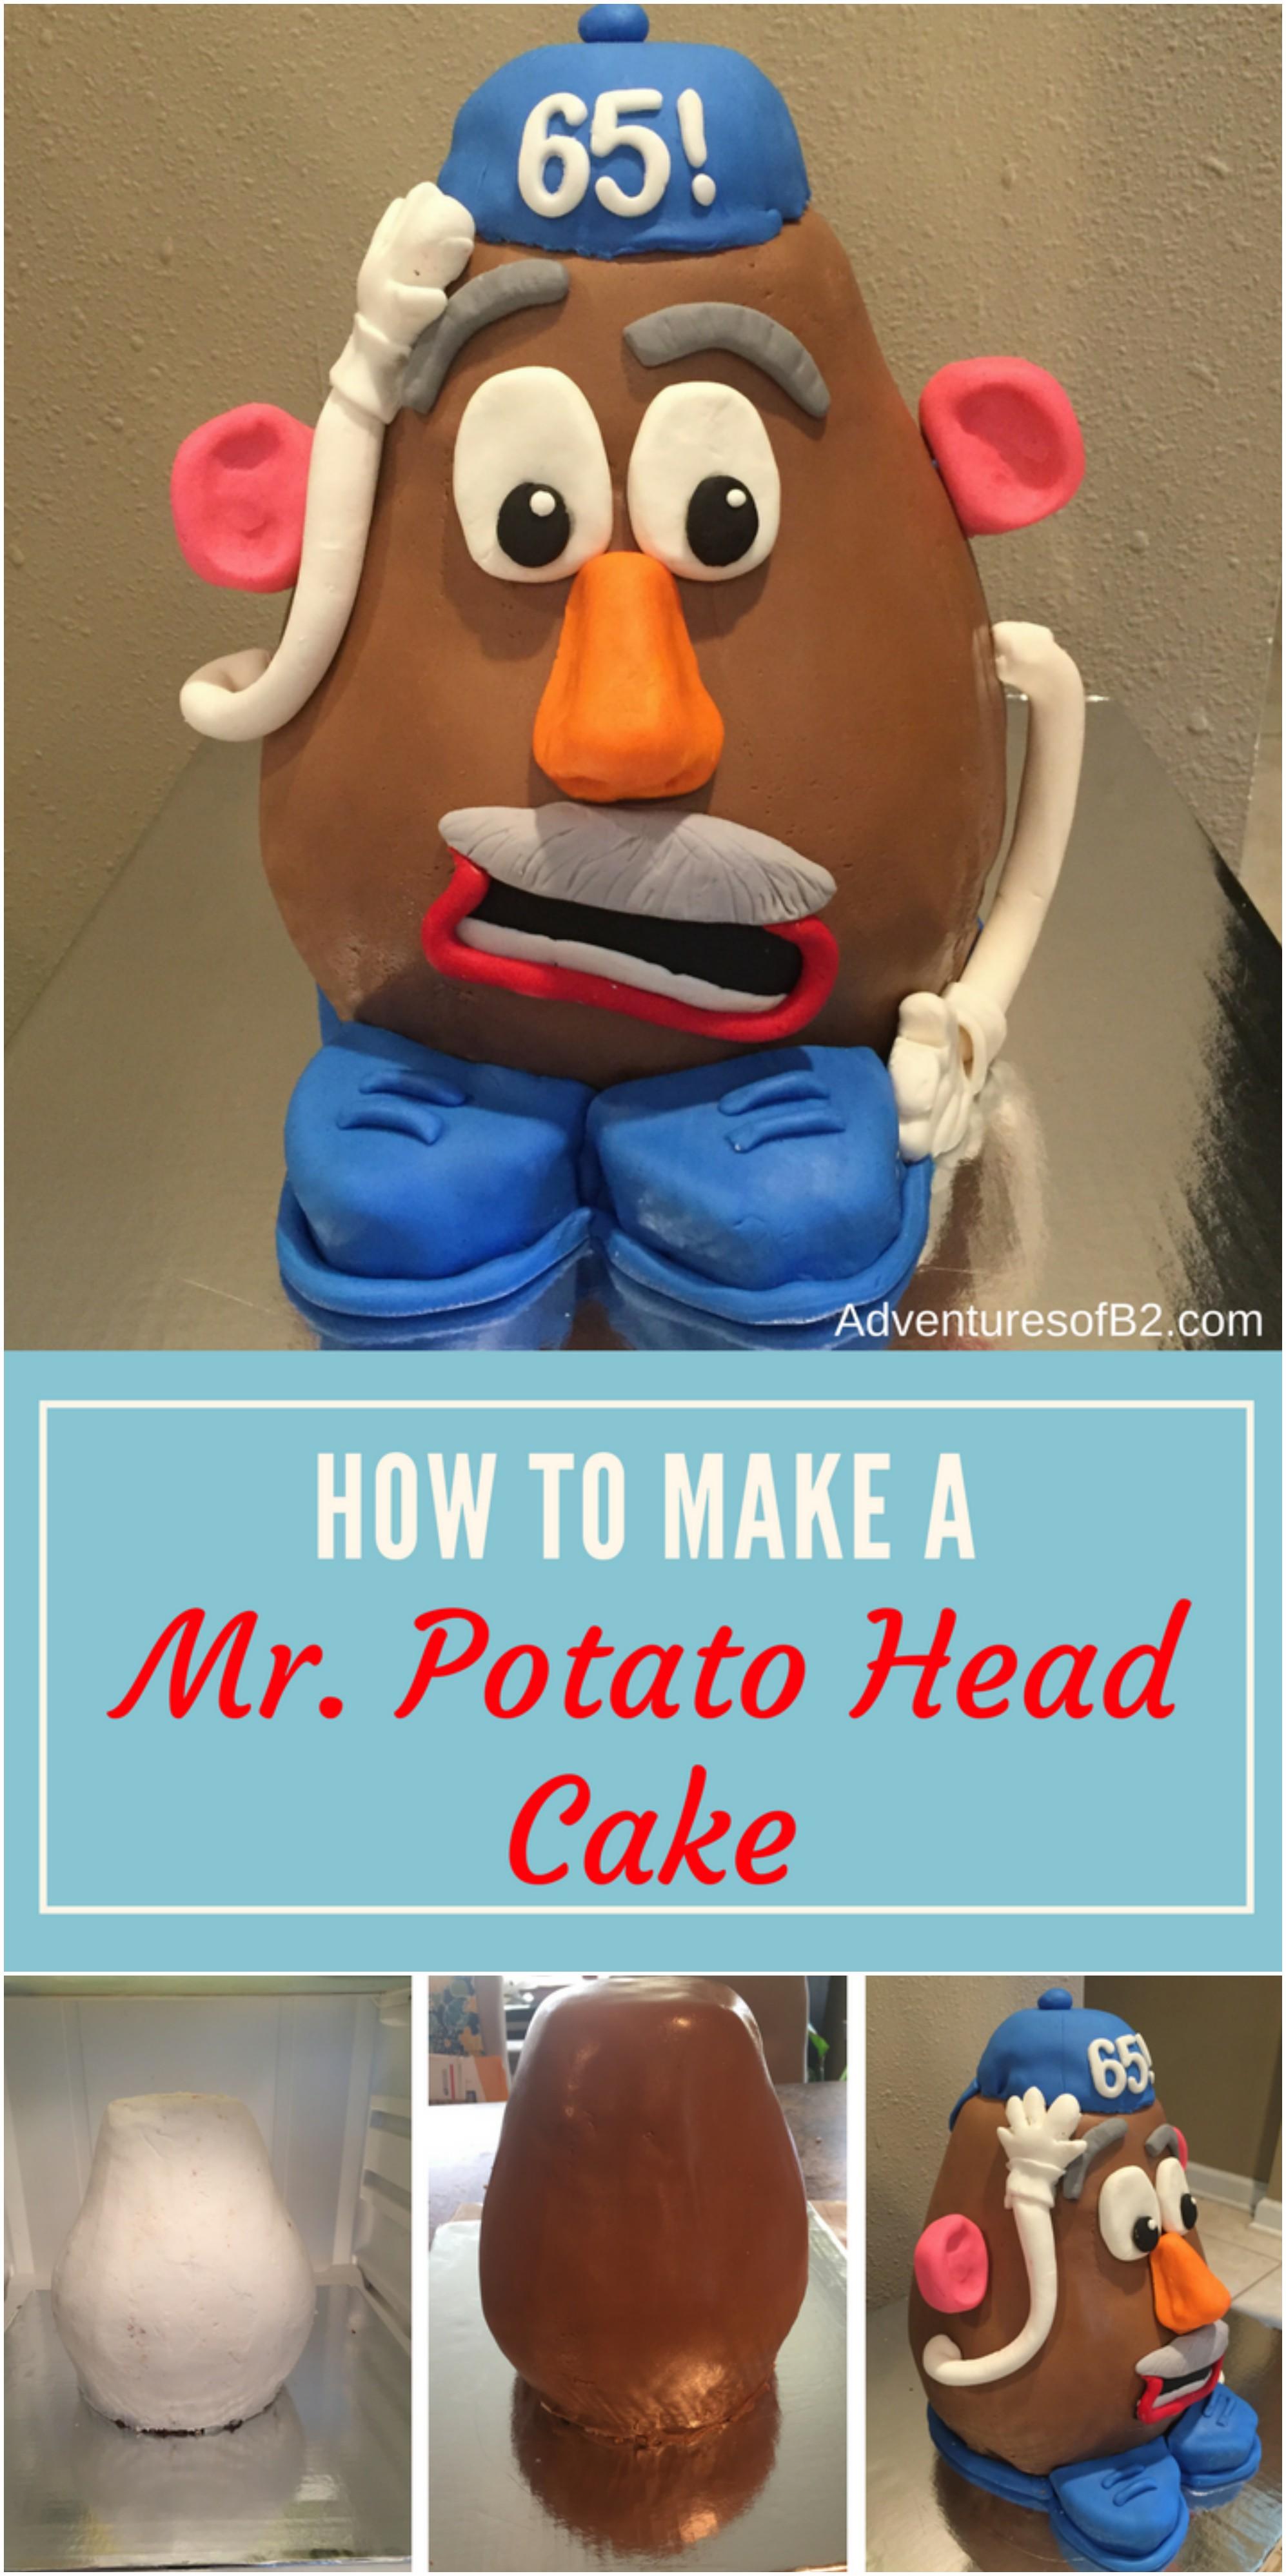 How to make a Mr. Potato Head Cake